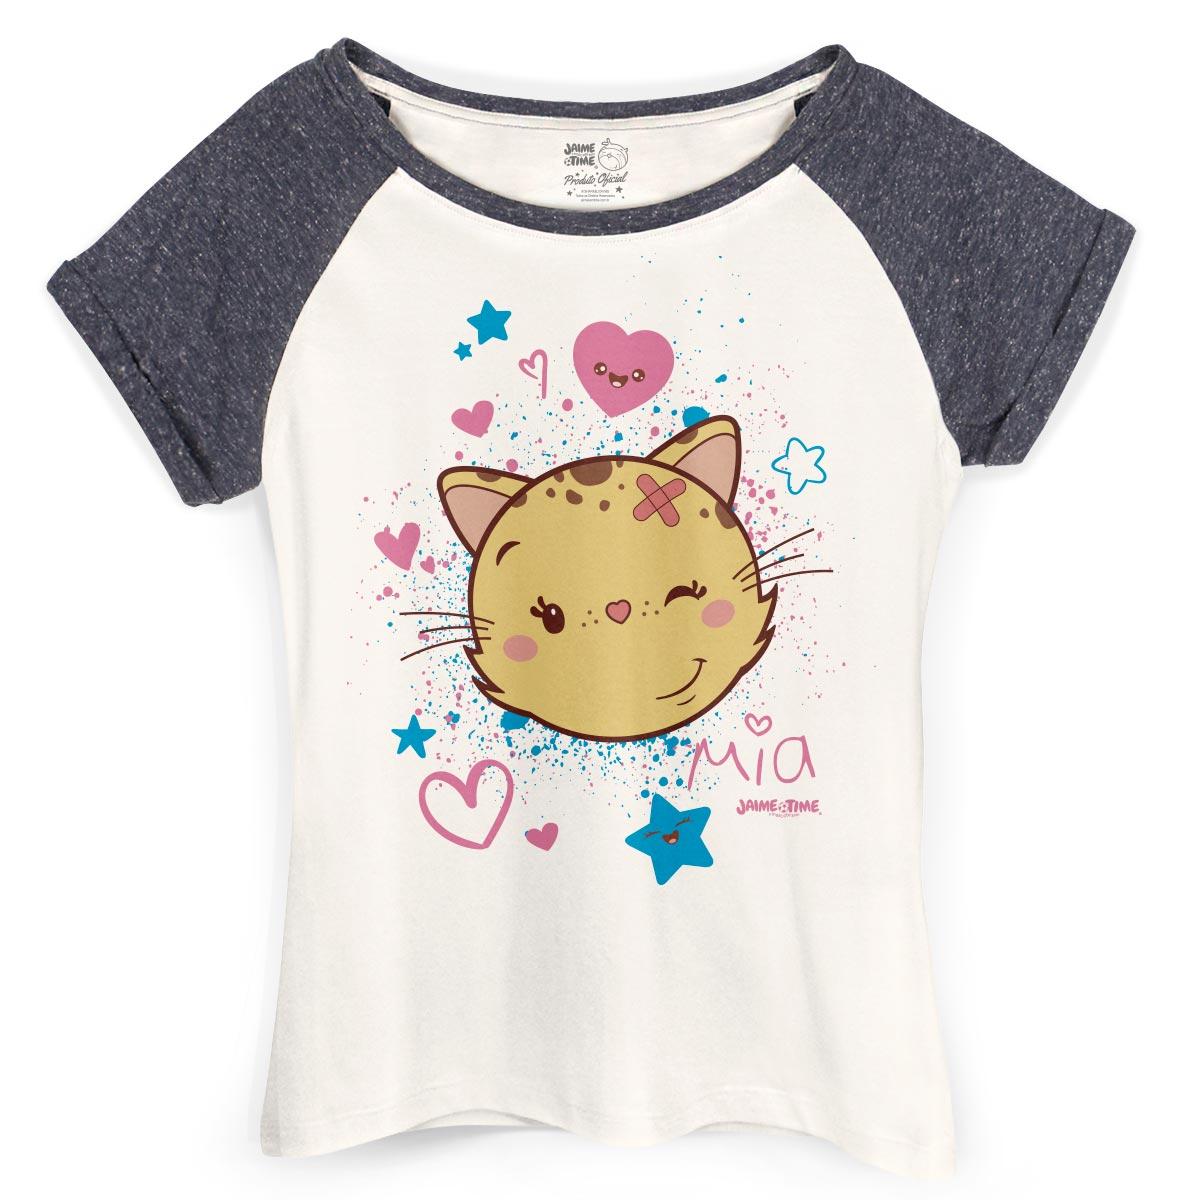 Camiseta Raglan Feminina Jaime Mia